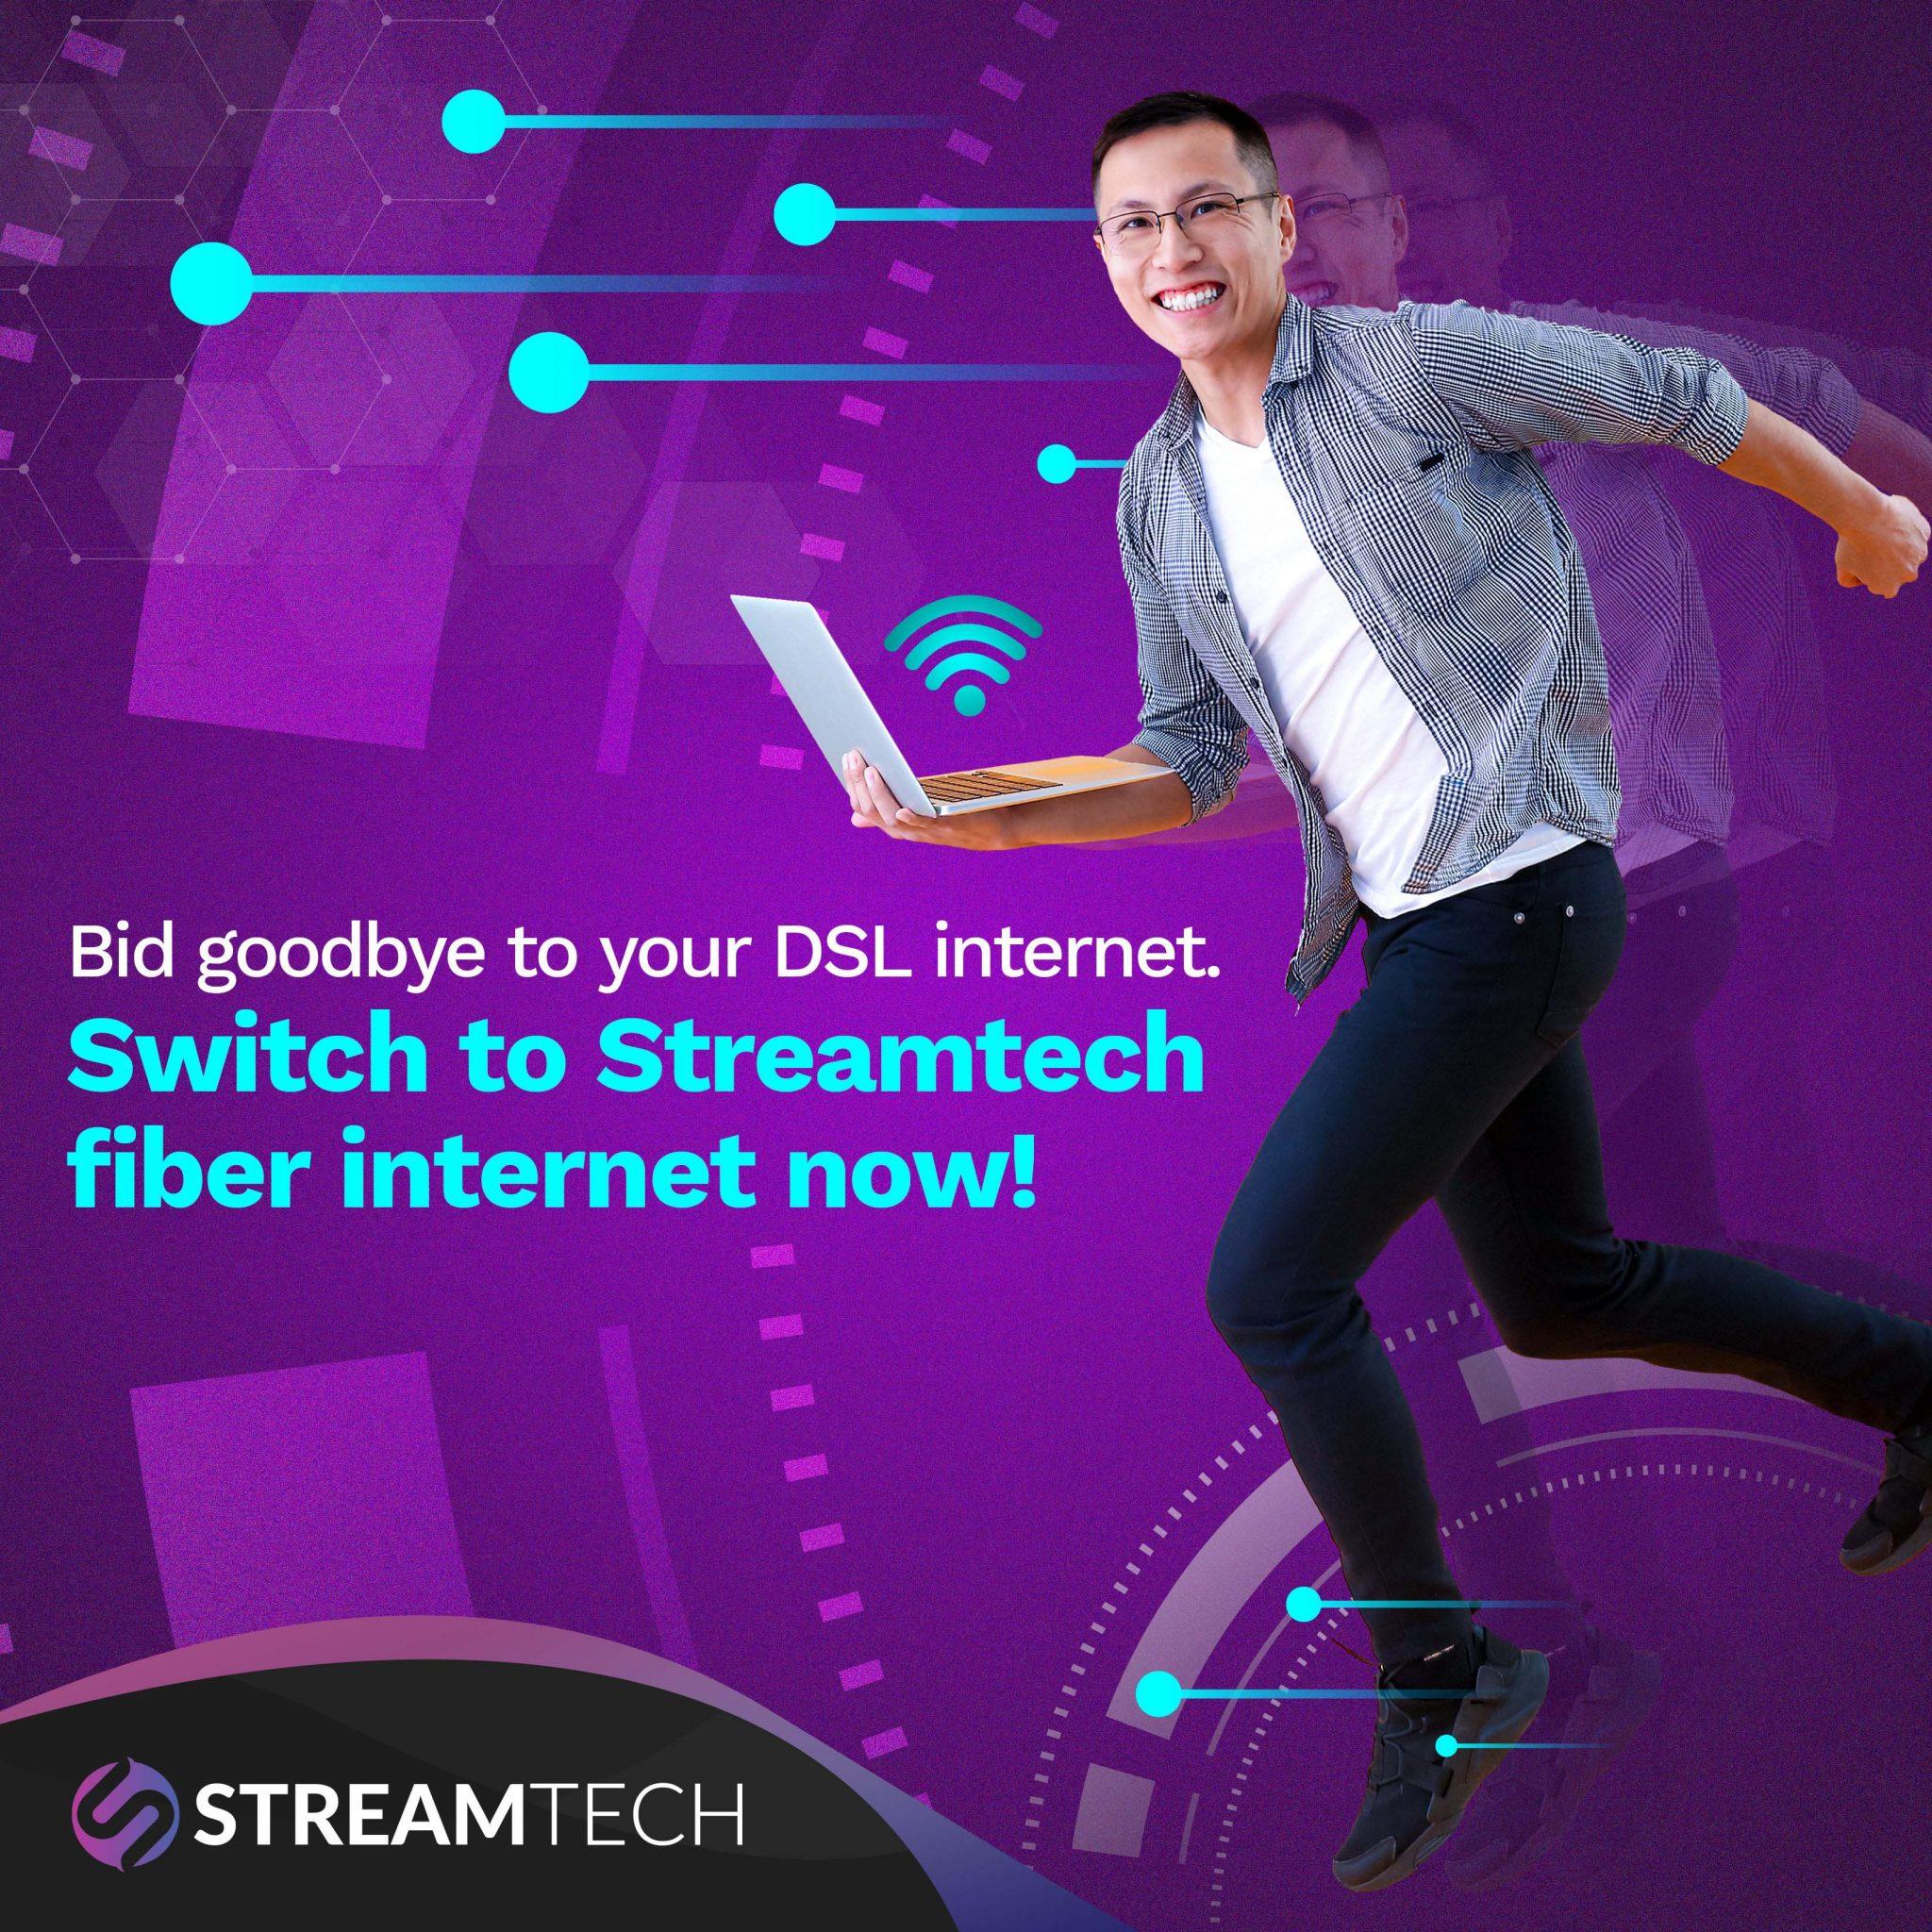 Switch to Streamtech's fiber internet vs DSL